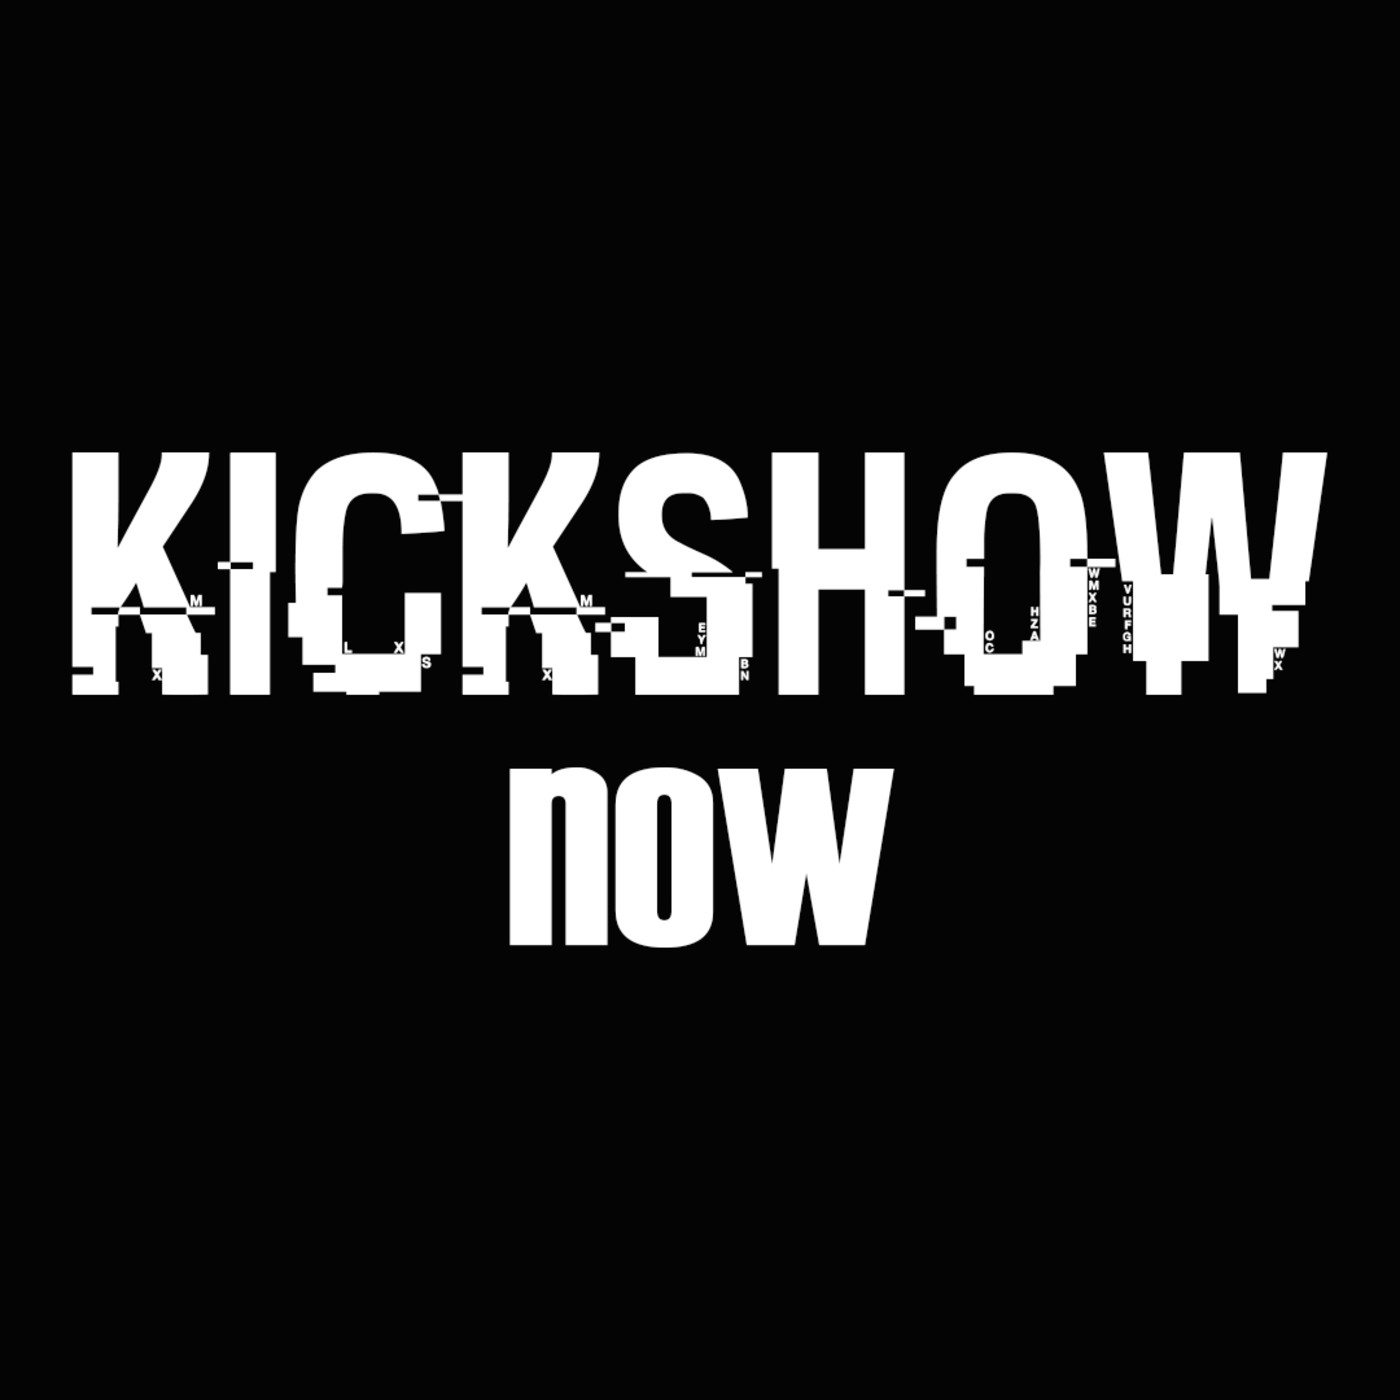 KICKSHOW NOW